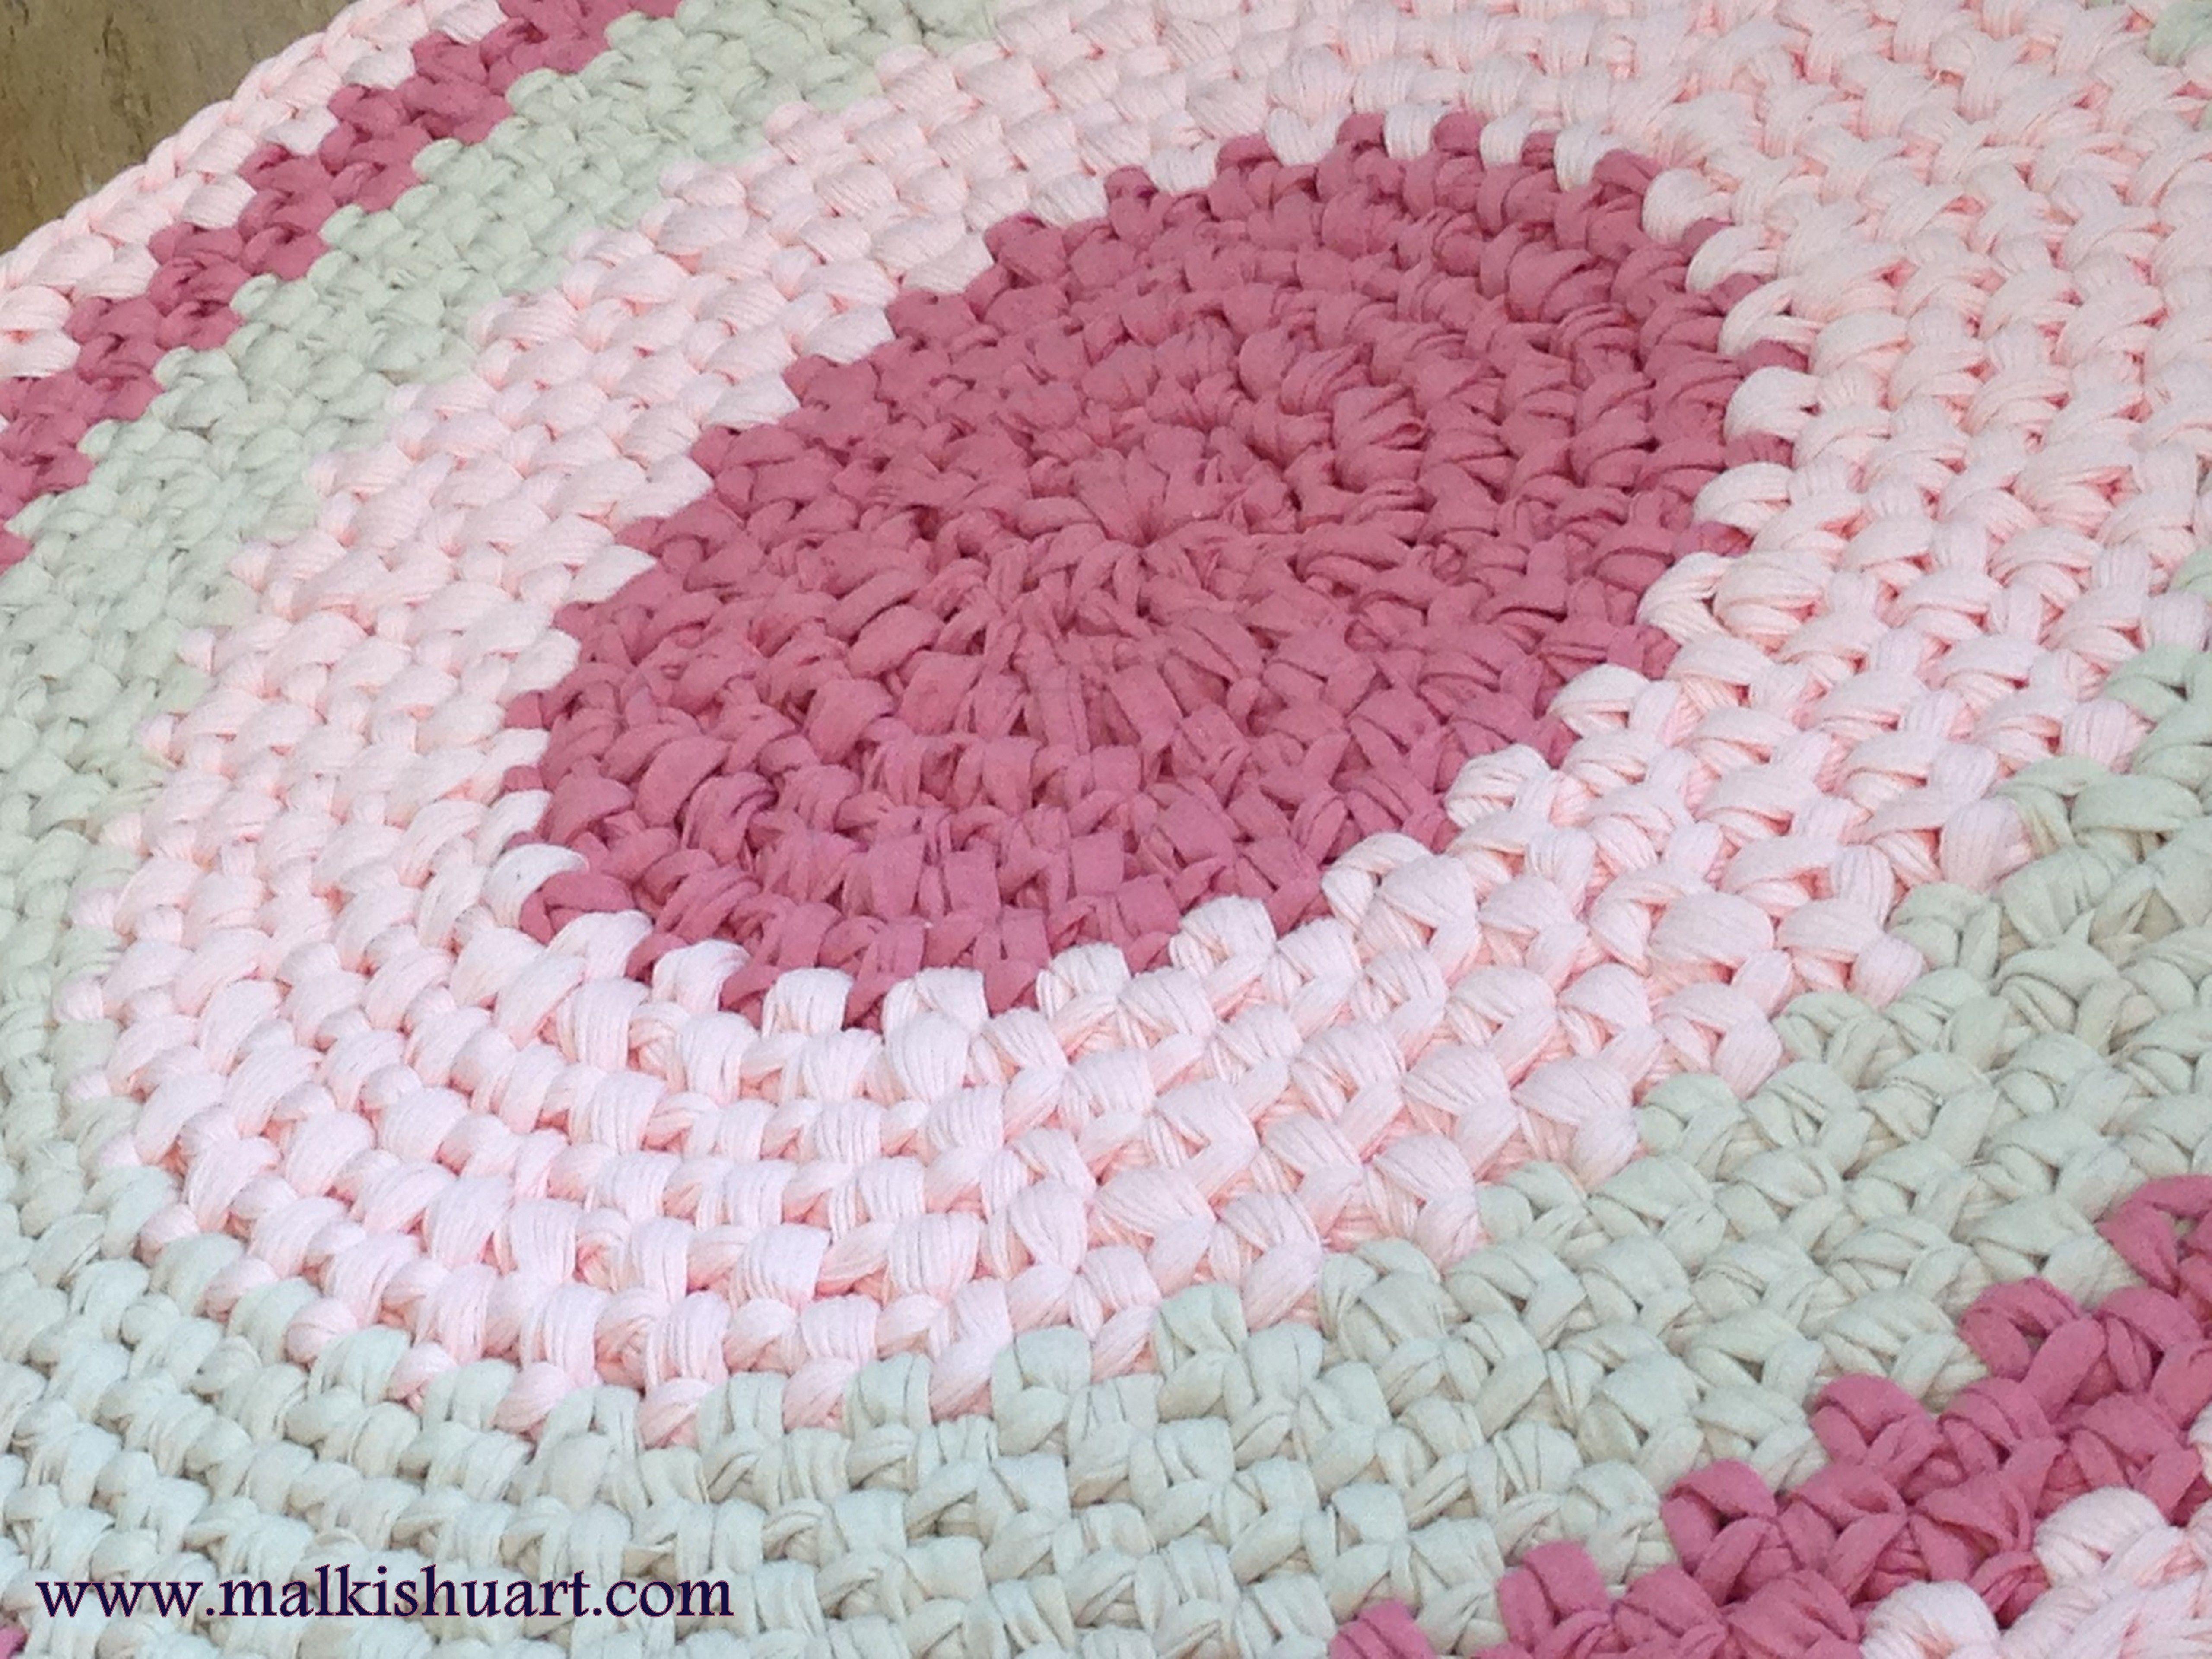 A Crochet Handmade Rug Made Of T Shirt Yarn  Trapillo